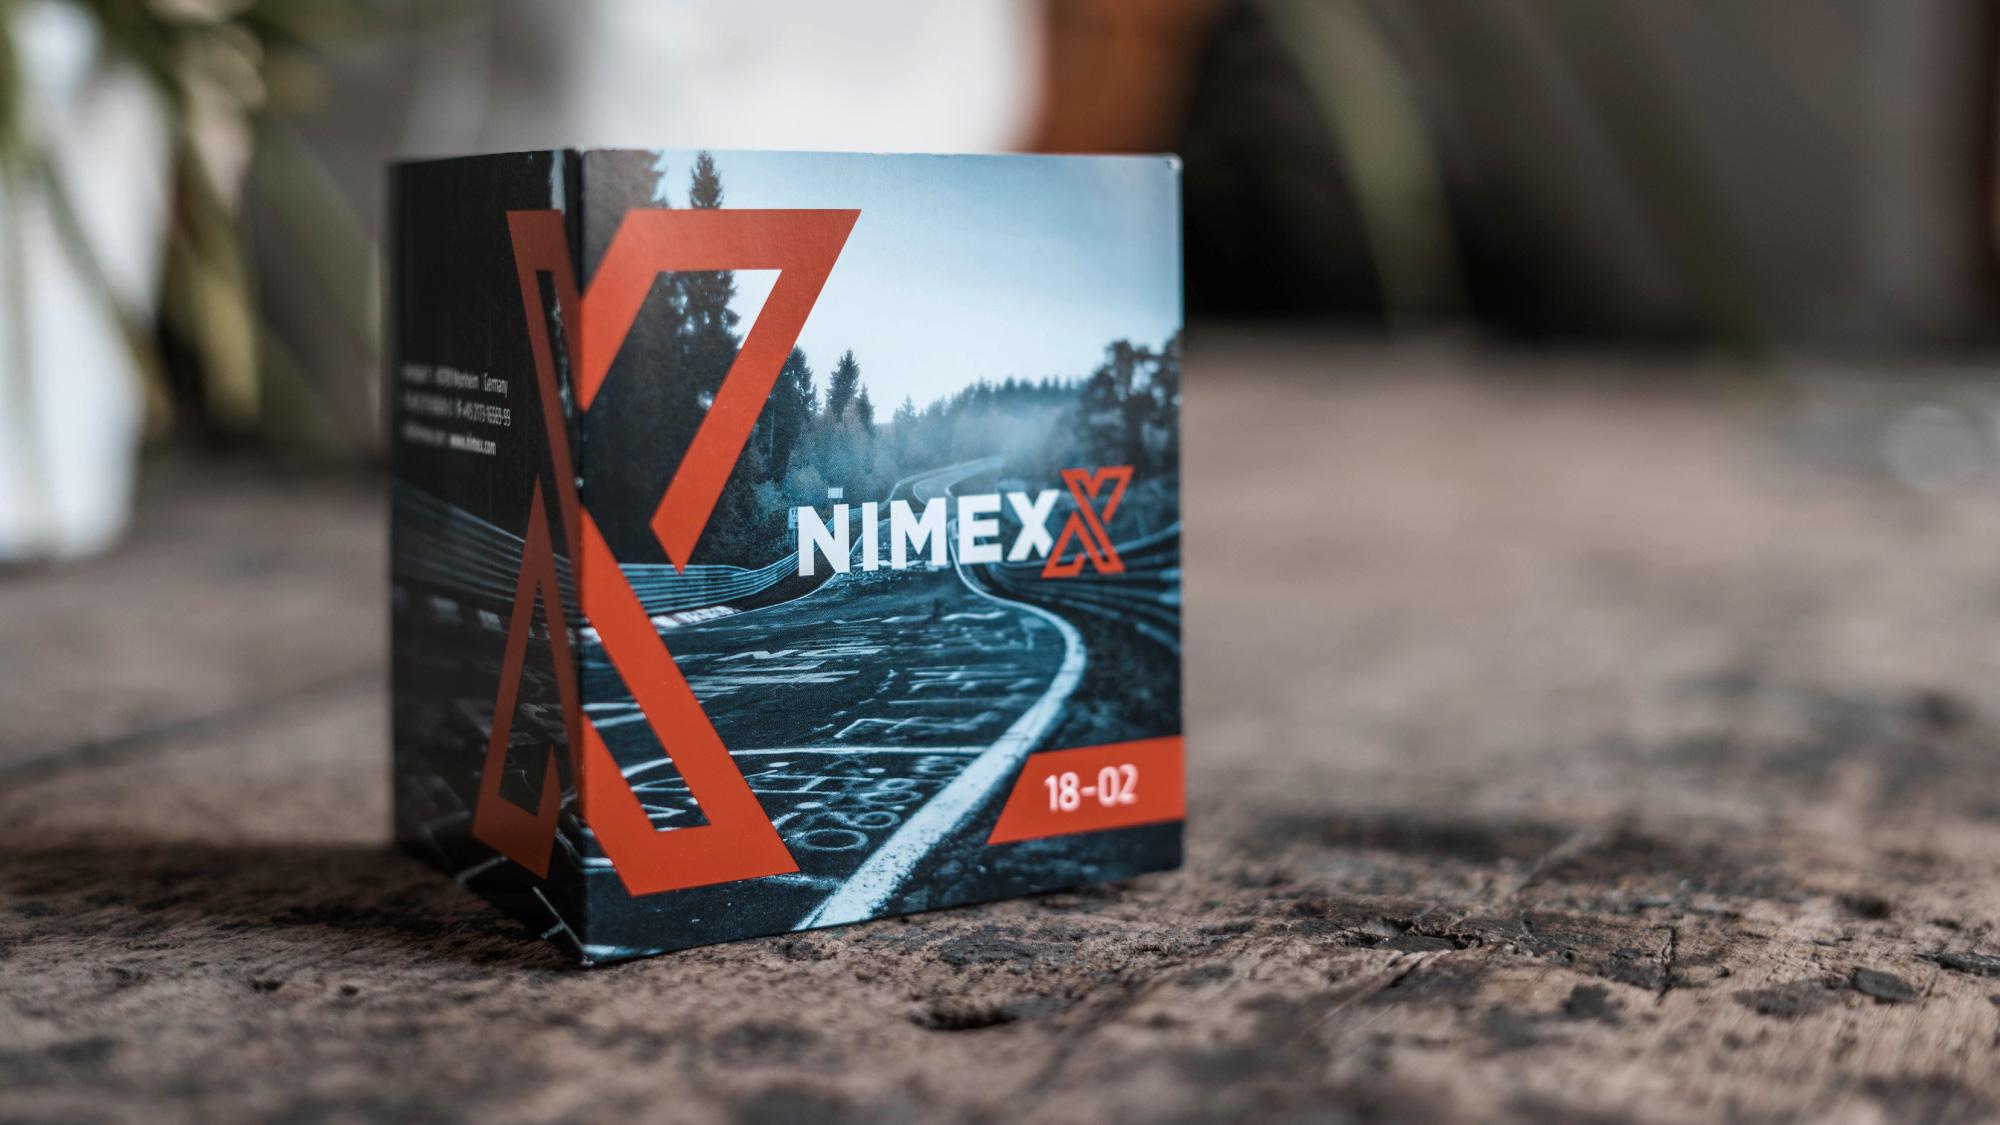 CD_NIMEX_Folder.jpg